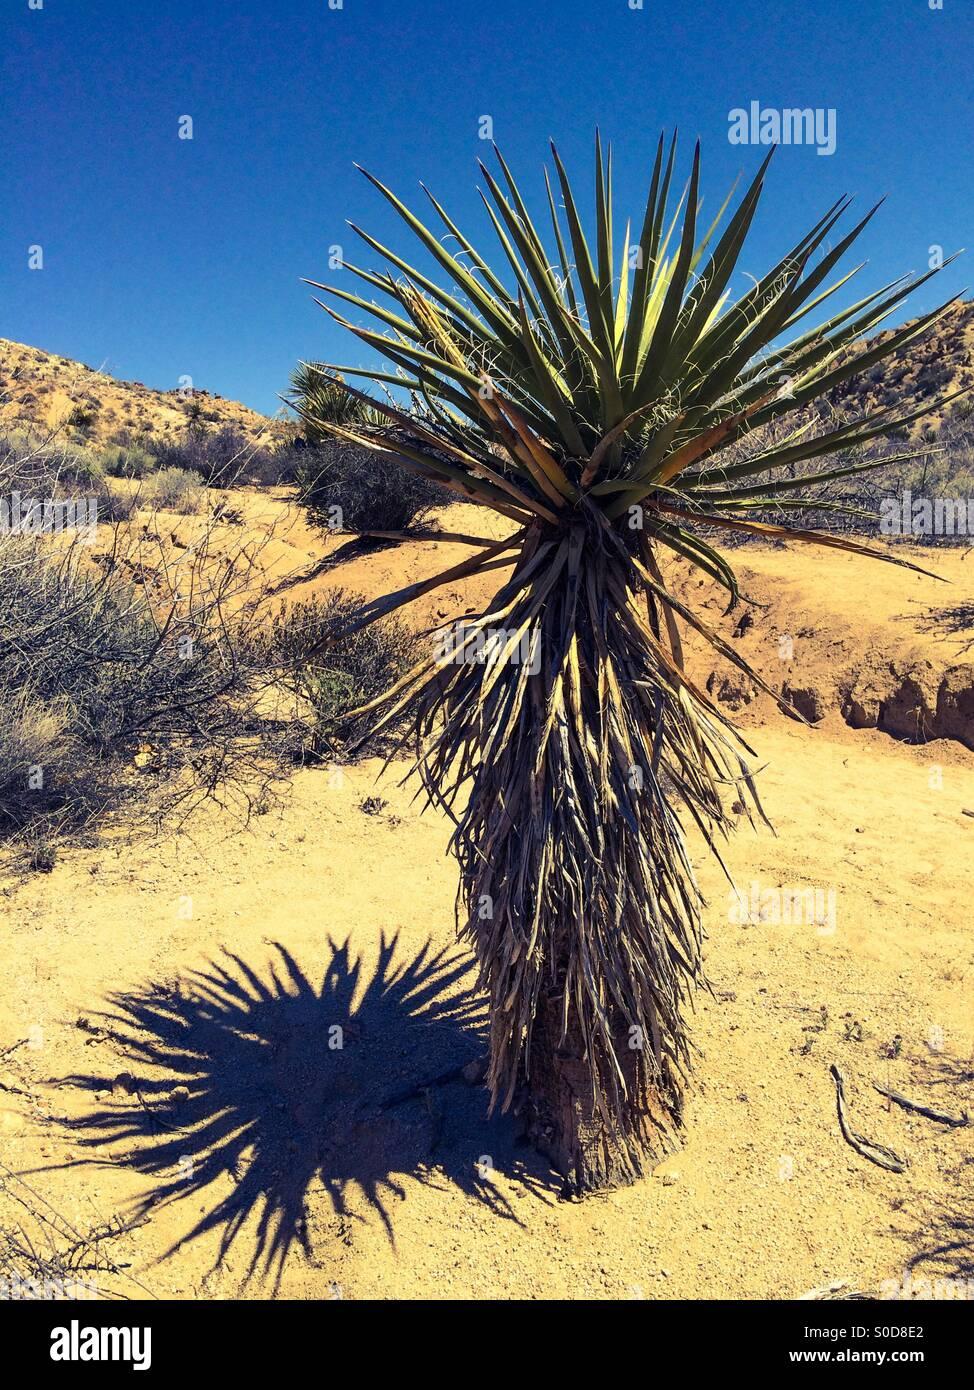 The mojave yucca essay